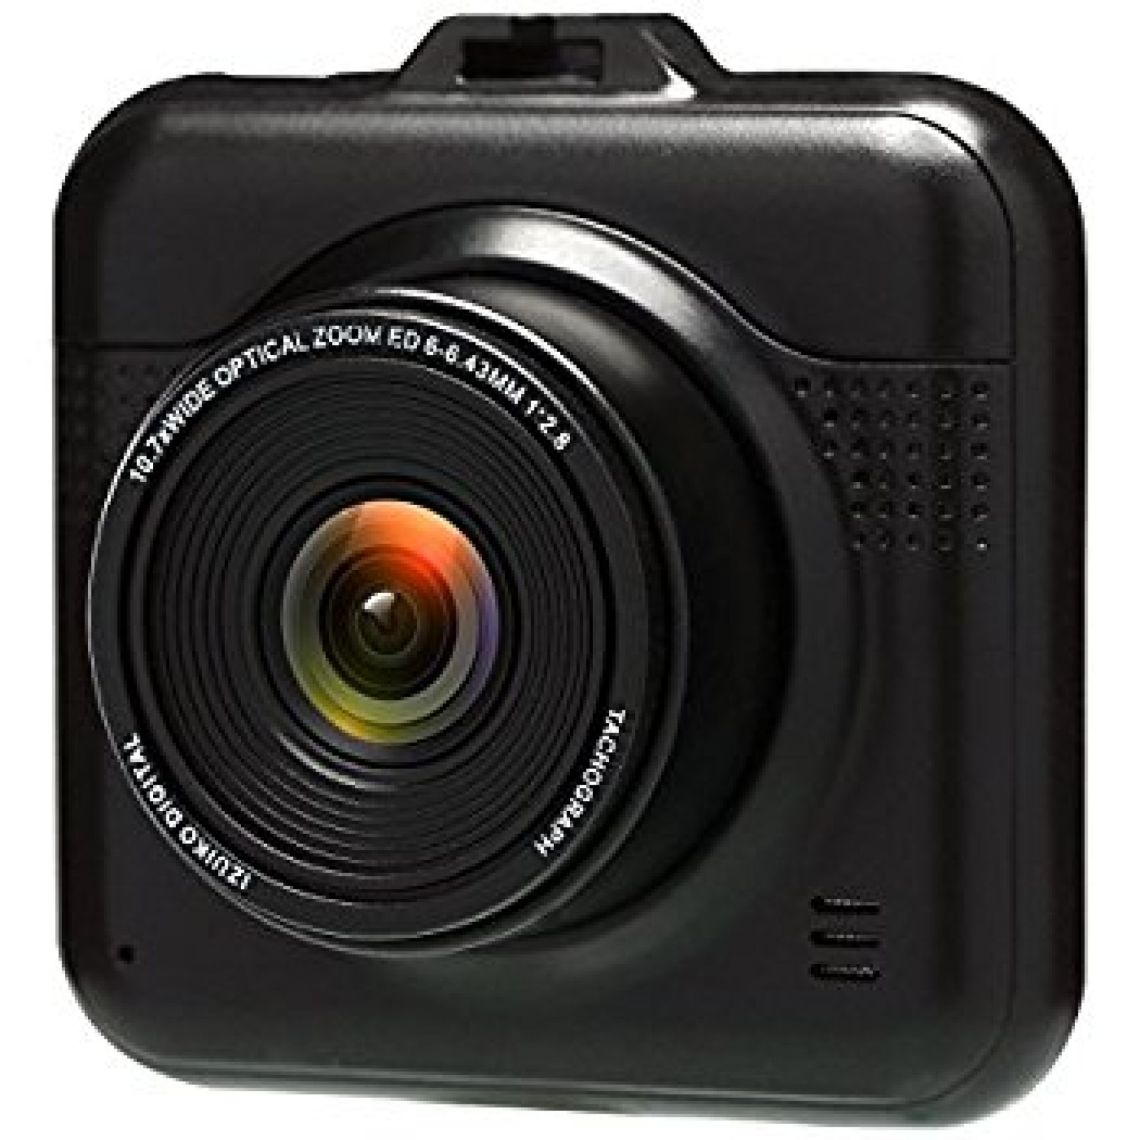 "Amazon.com: BUIEJDOG 2.0"" Car Dash Cam 1080P LCD Driving Video Recorder 170 Degree Car Camera Recorder Built-in G-Sensor-Night vision -Loop Recording-Parking Monitor Dashboard Camera (Black): Cell Phones & Accessories"